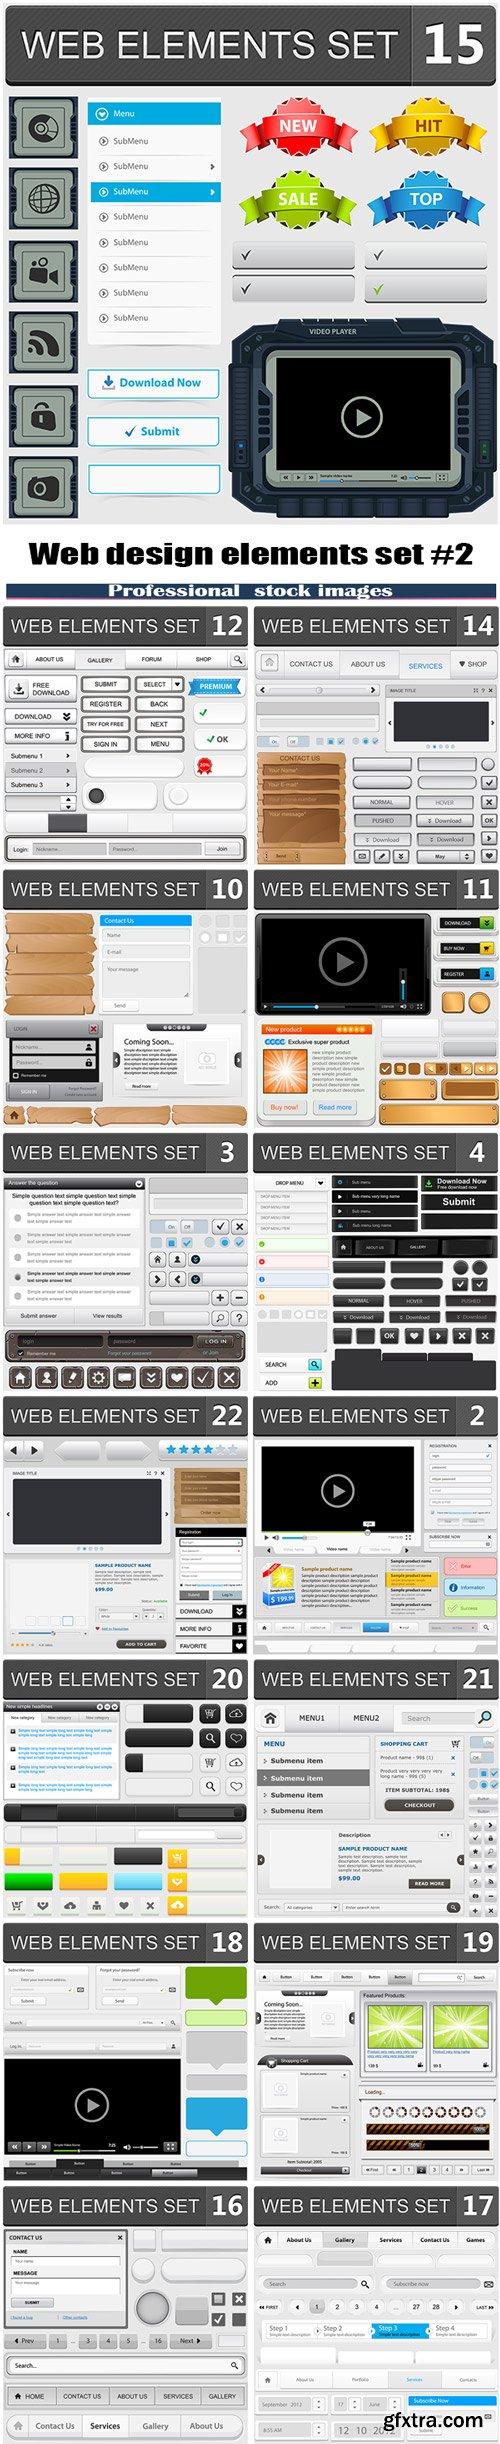 Web design elements set #2